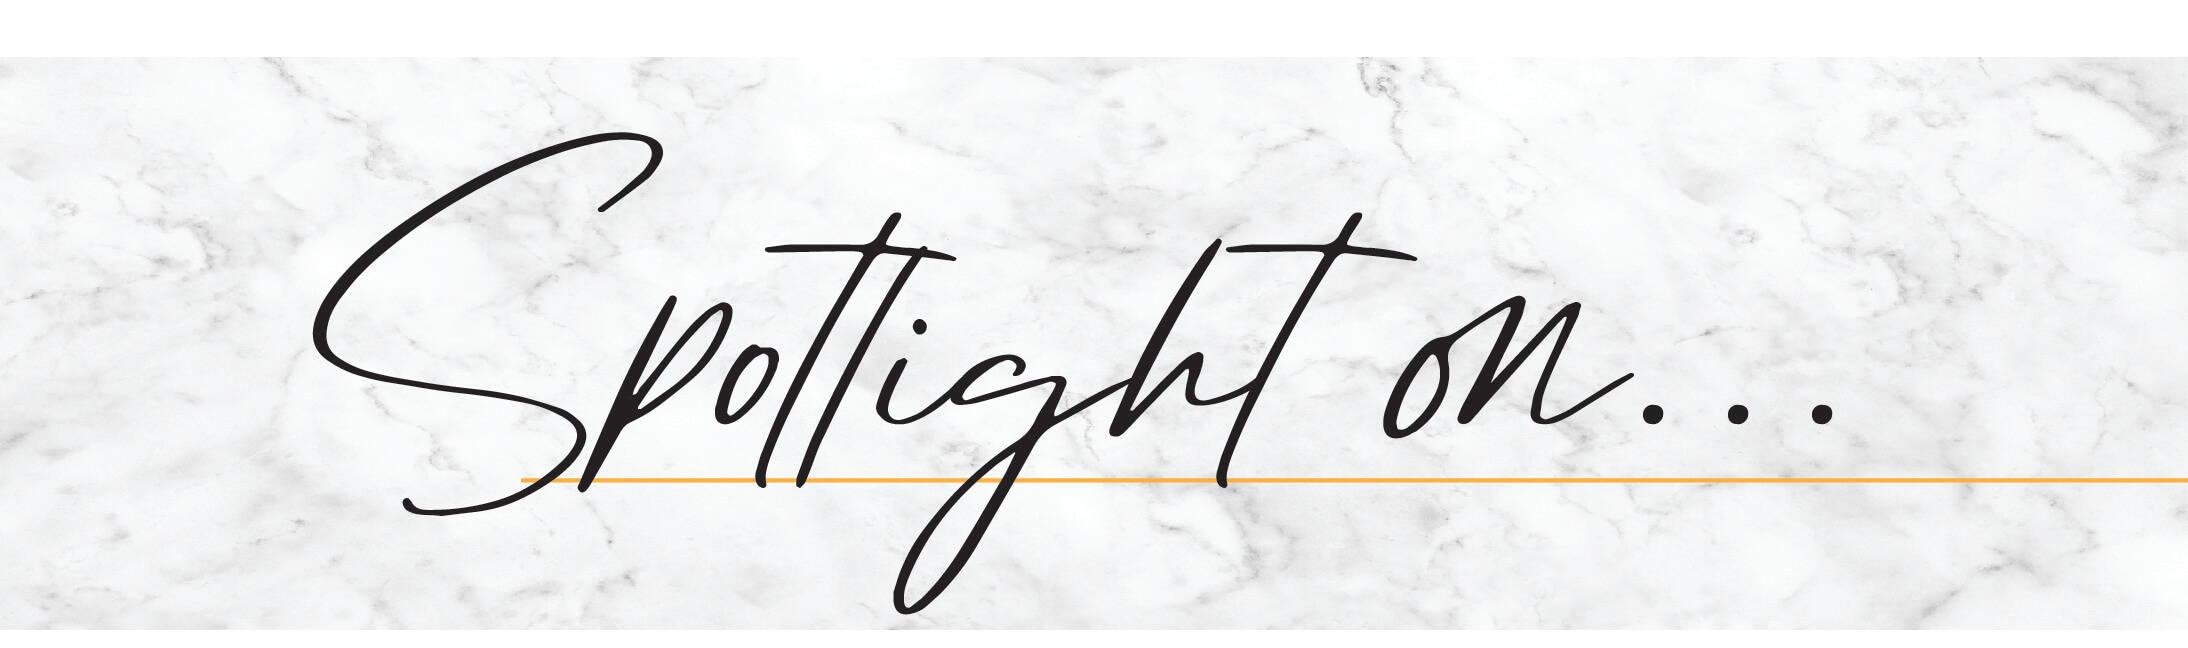 spotlight on text heading